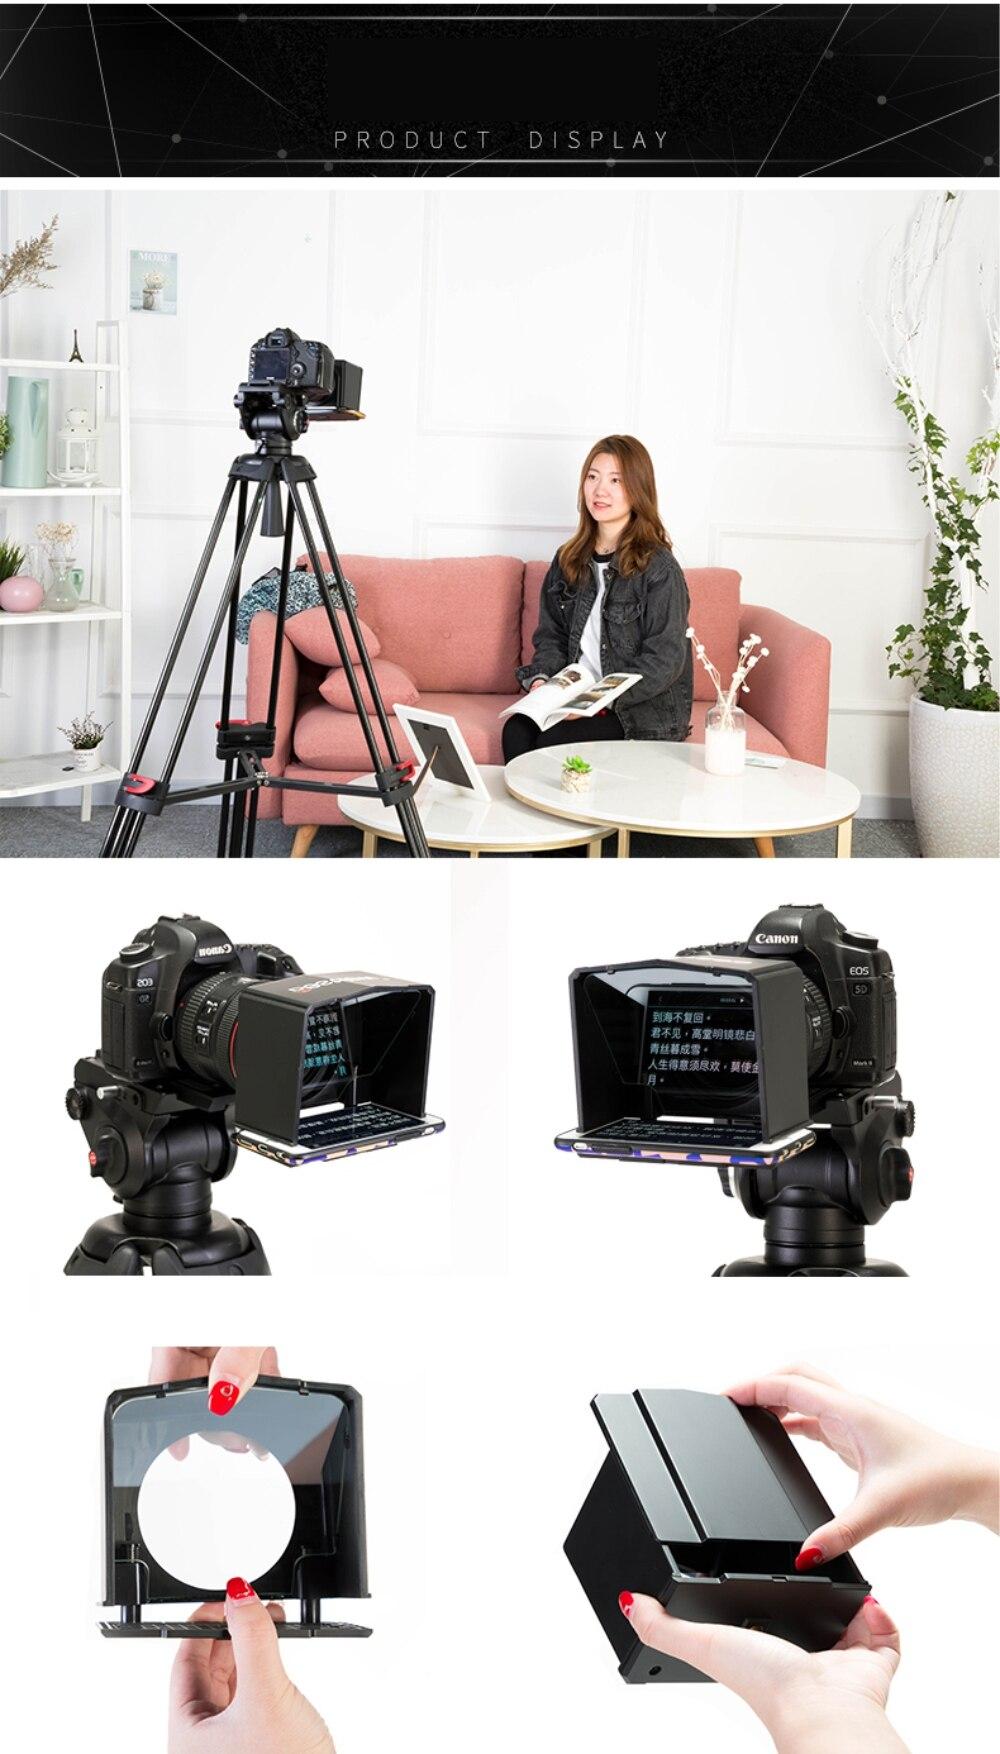 Bestview Smartphone Teleprompter for Canon Nikon Sony Camera Photo Studio DSLR for Youtube Interview Teleprompter Video Camera dji